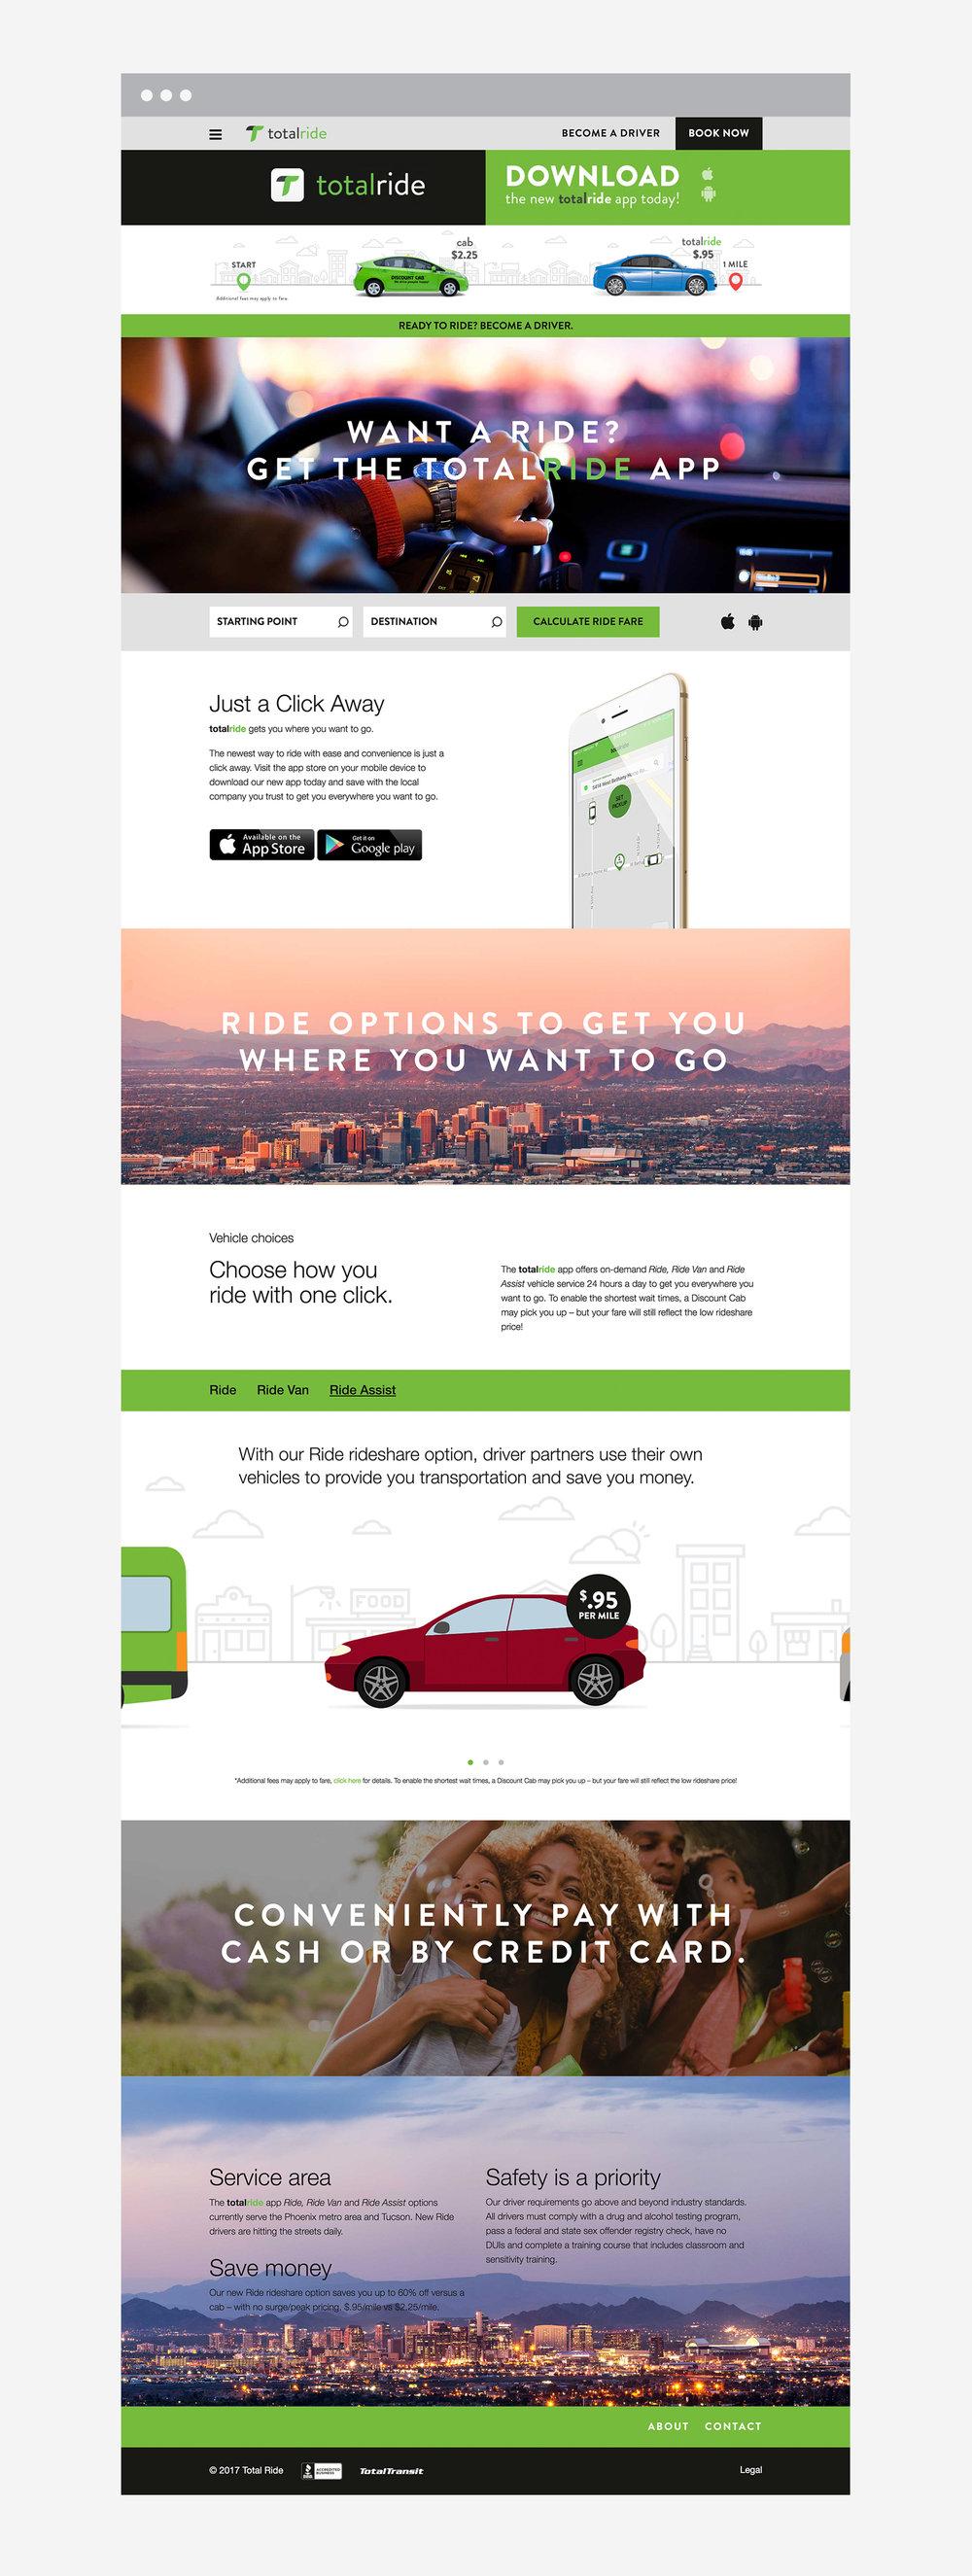 Website design and branding for Phoenix, Arizona transportation company and rideshare app